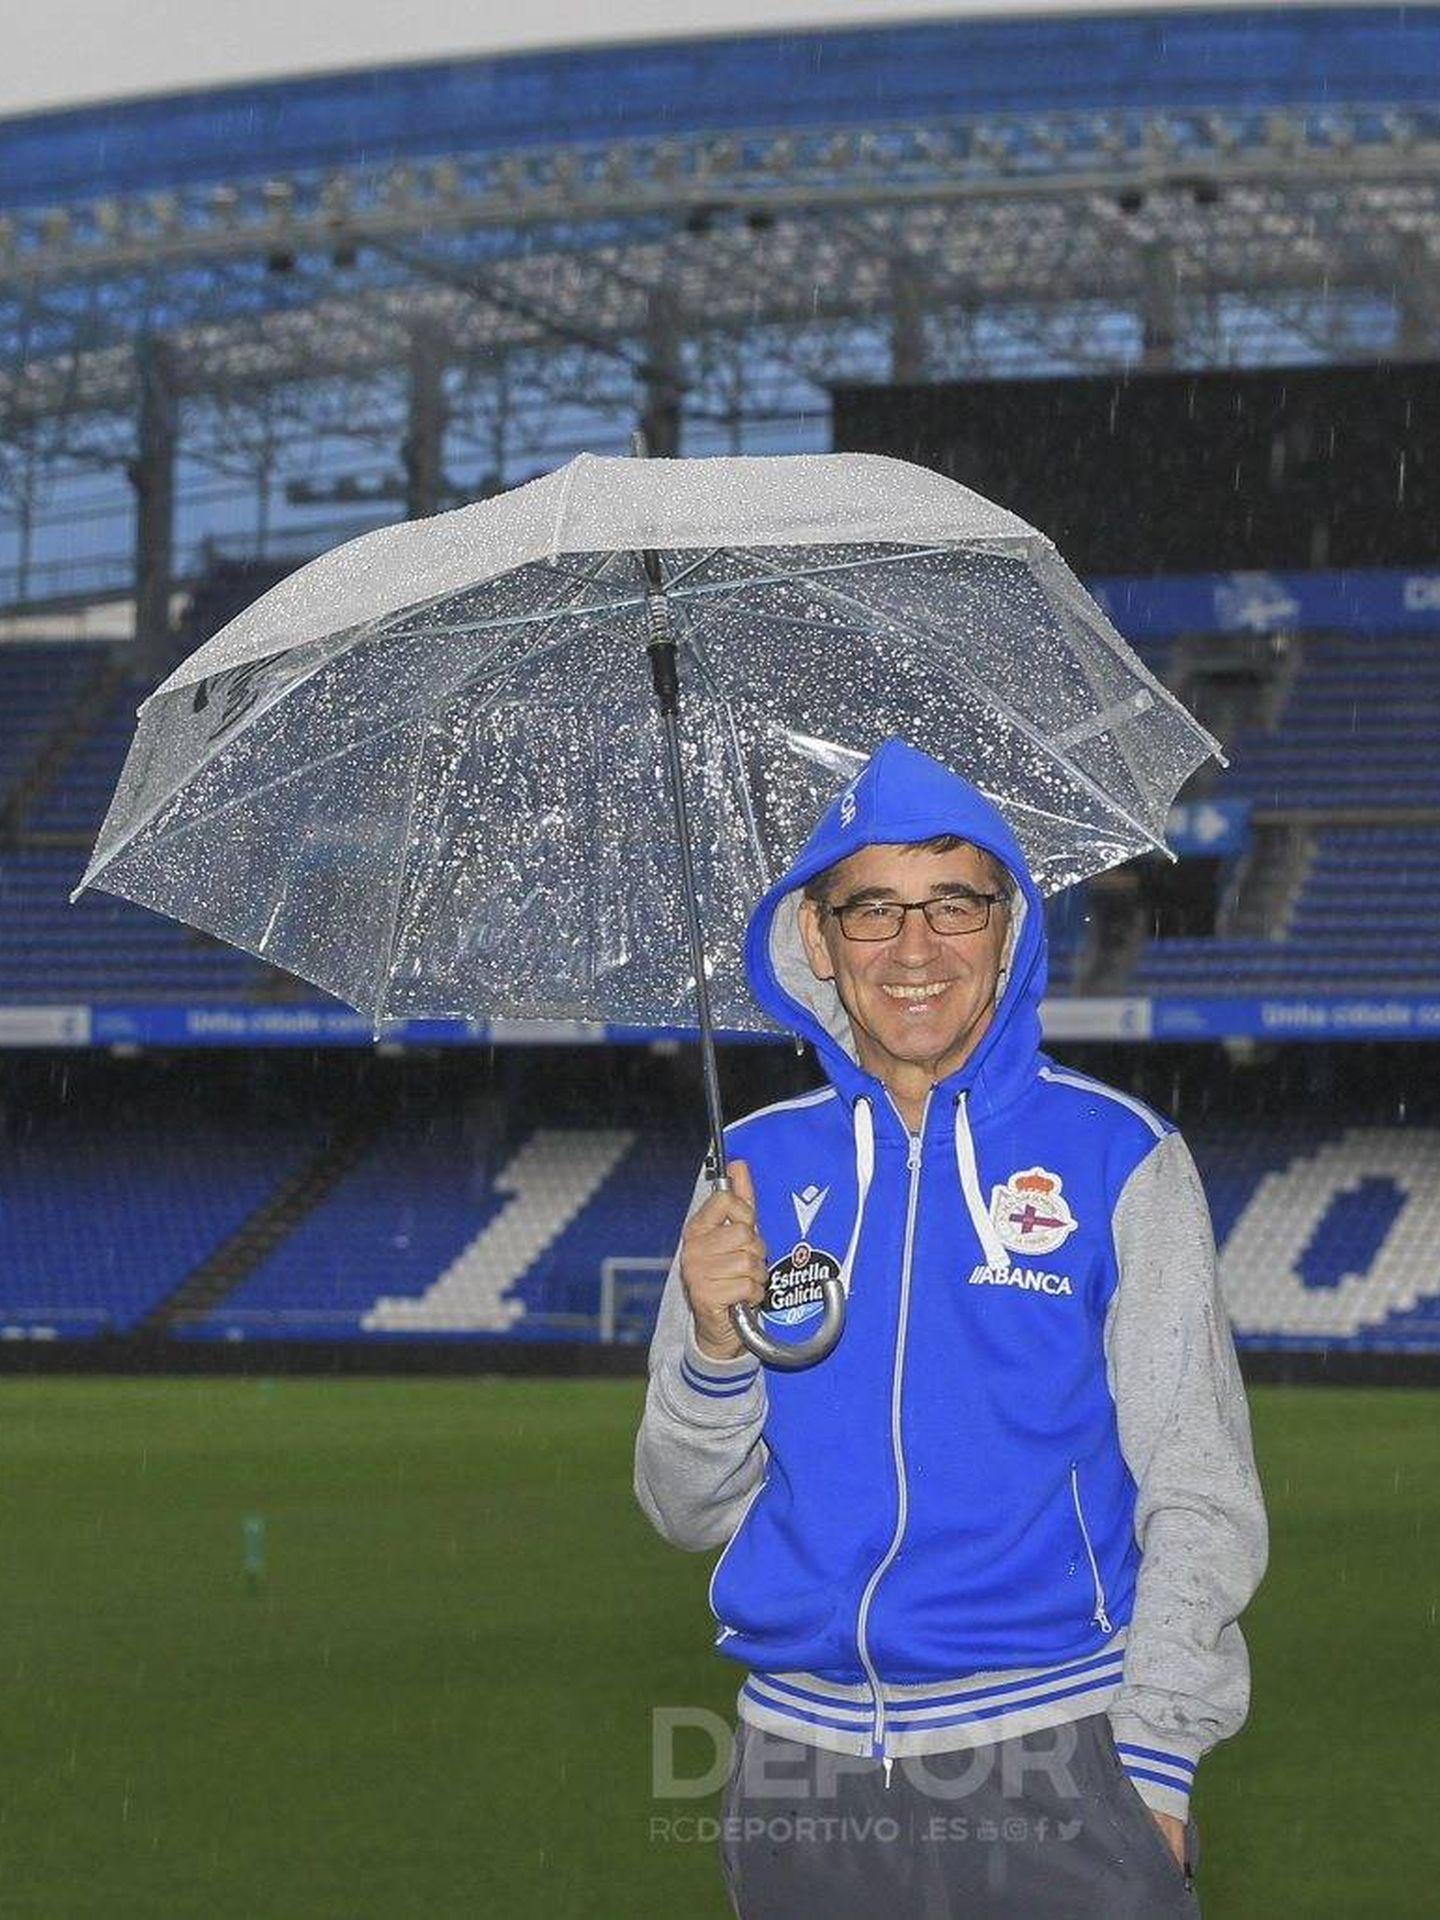 Fernando Vázquez en Riazor. (@RCDeportivo)